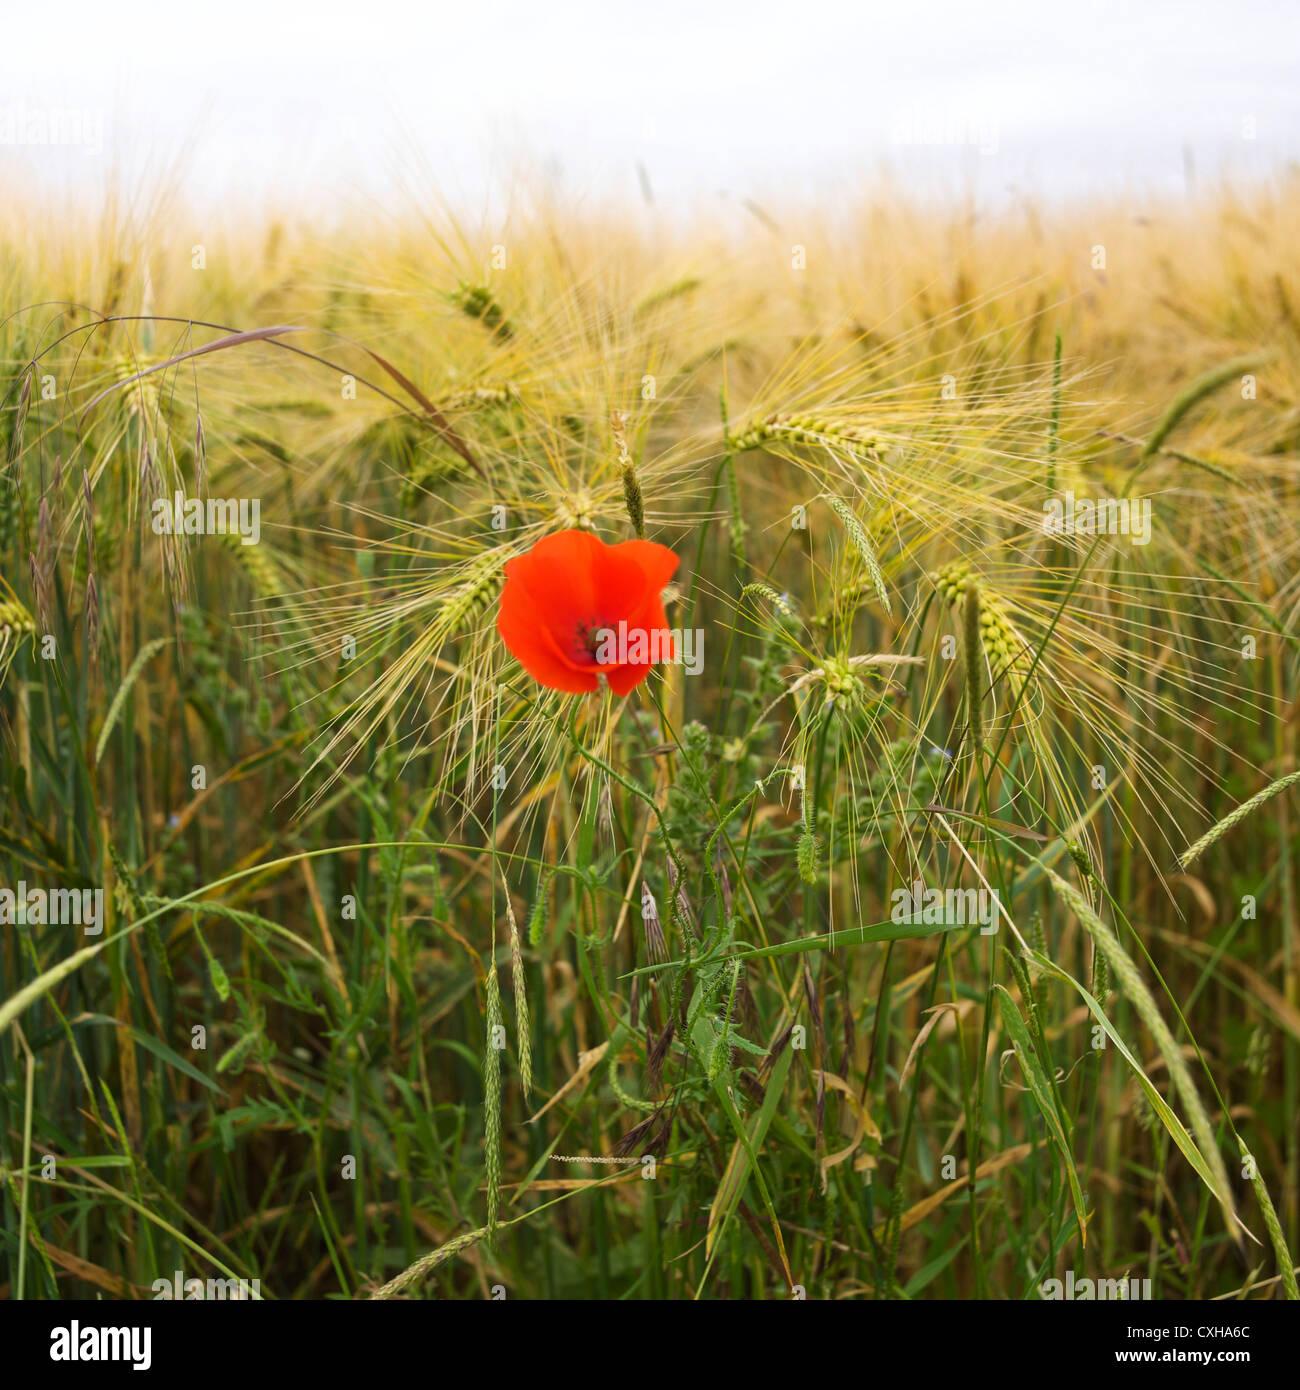 En un campo de cultivo de cebada Imagen De Stock